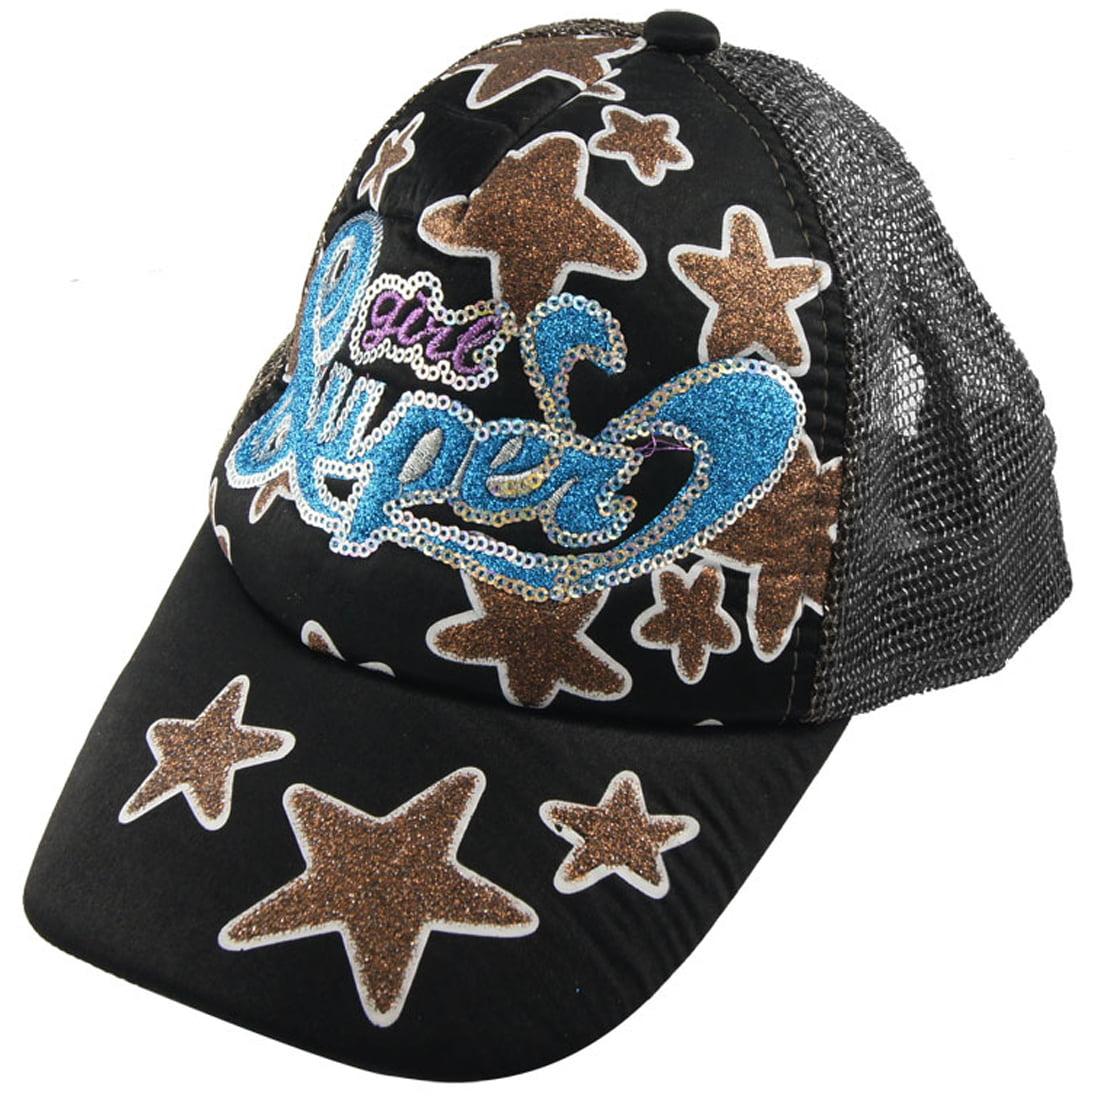 Unique Bargains Brown Five Point Star Adjustable Band Mesh Sun ... 8f7a2624a1e